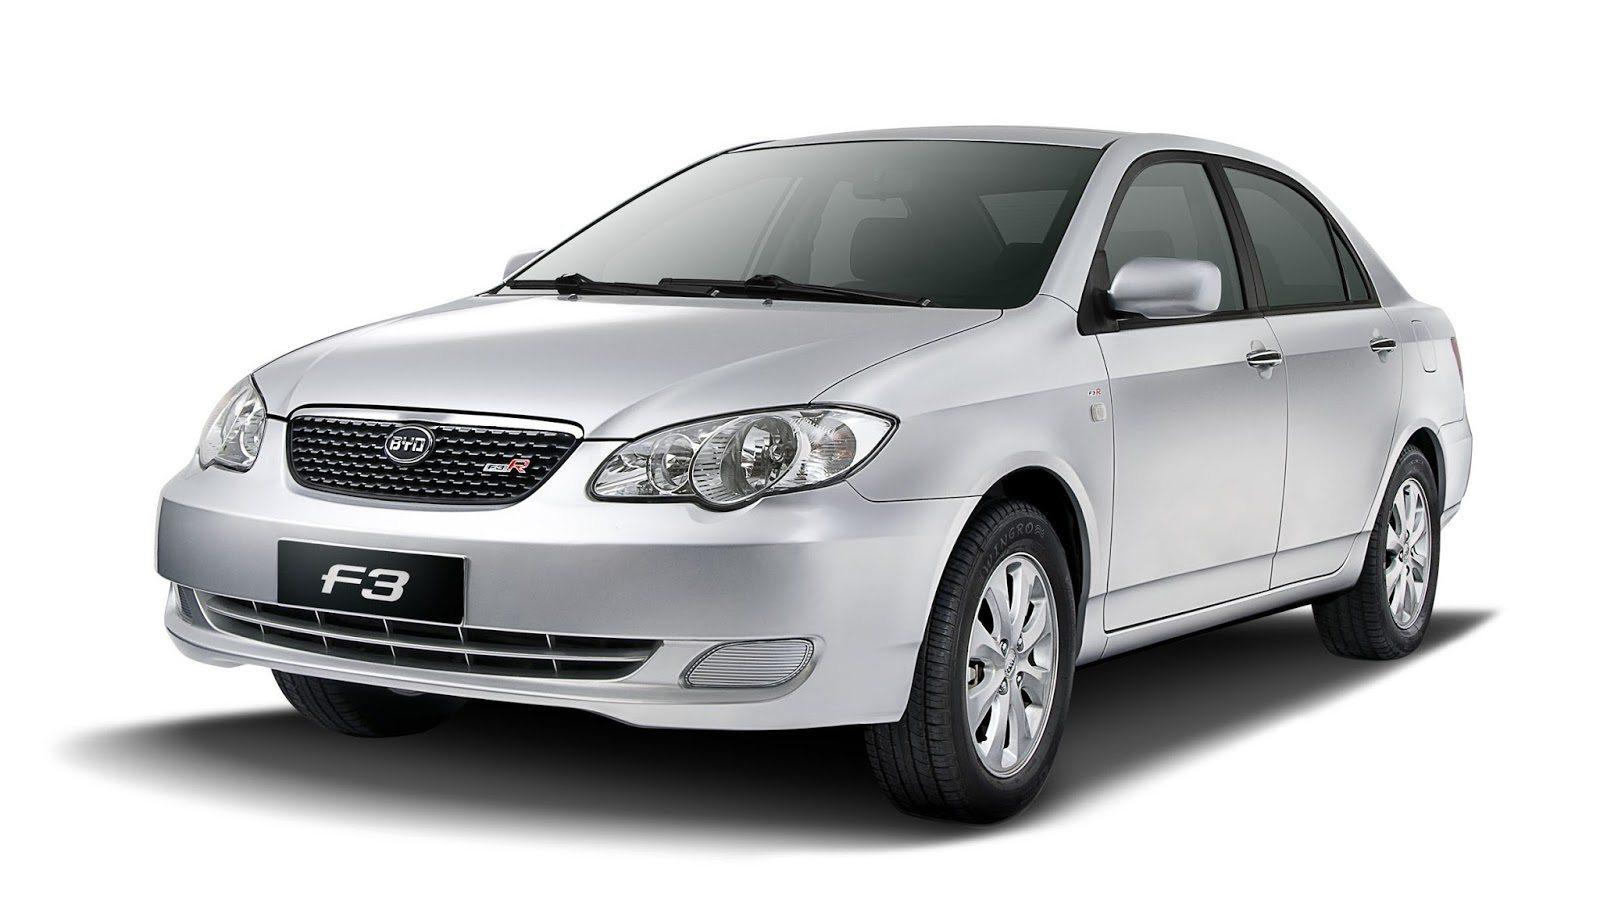 BYD F3 GLXI F3R 2018 carprices